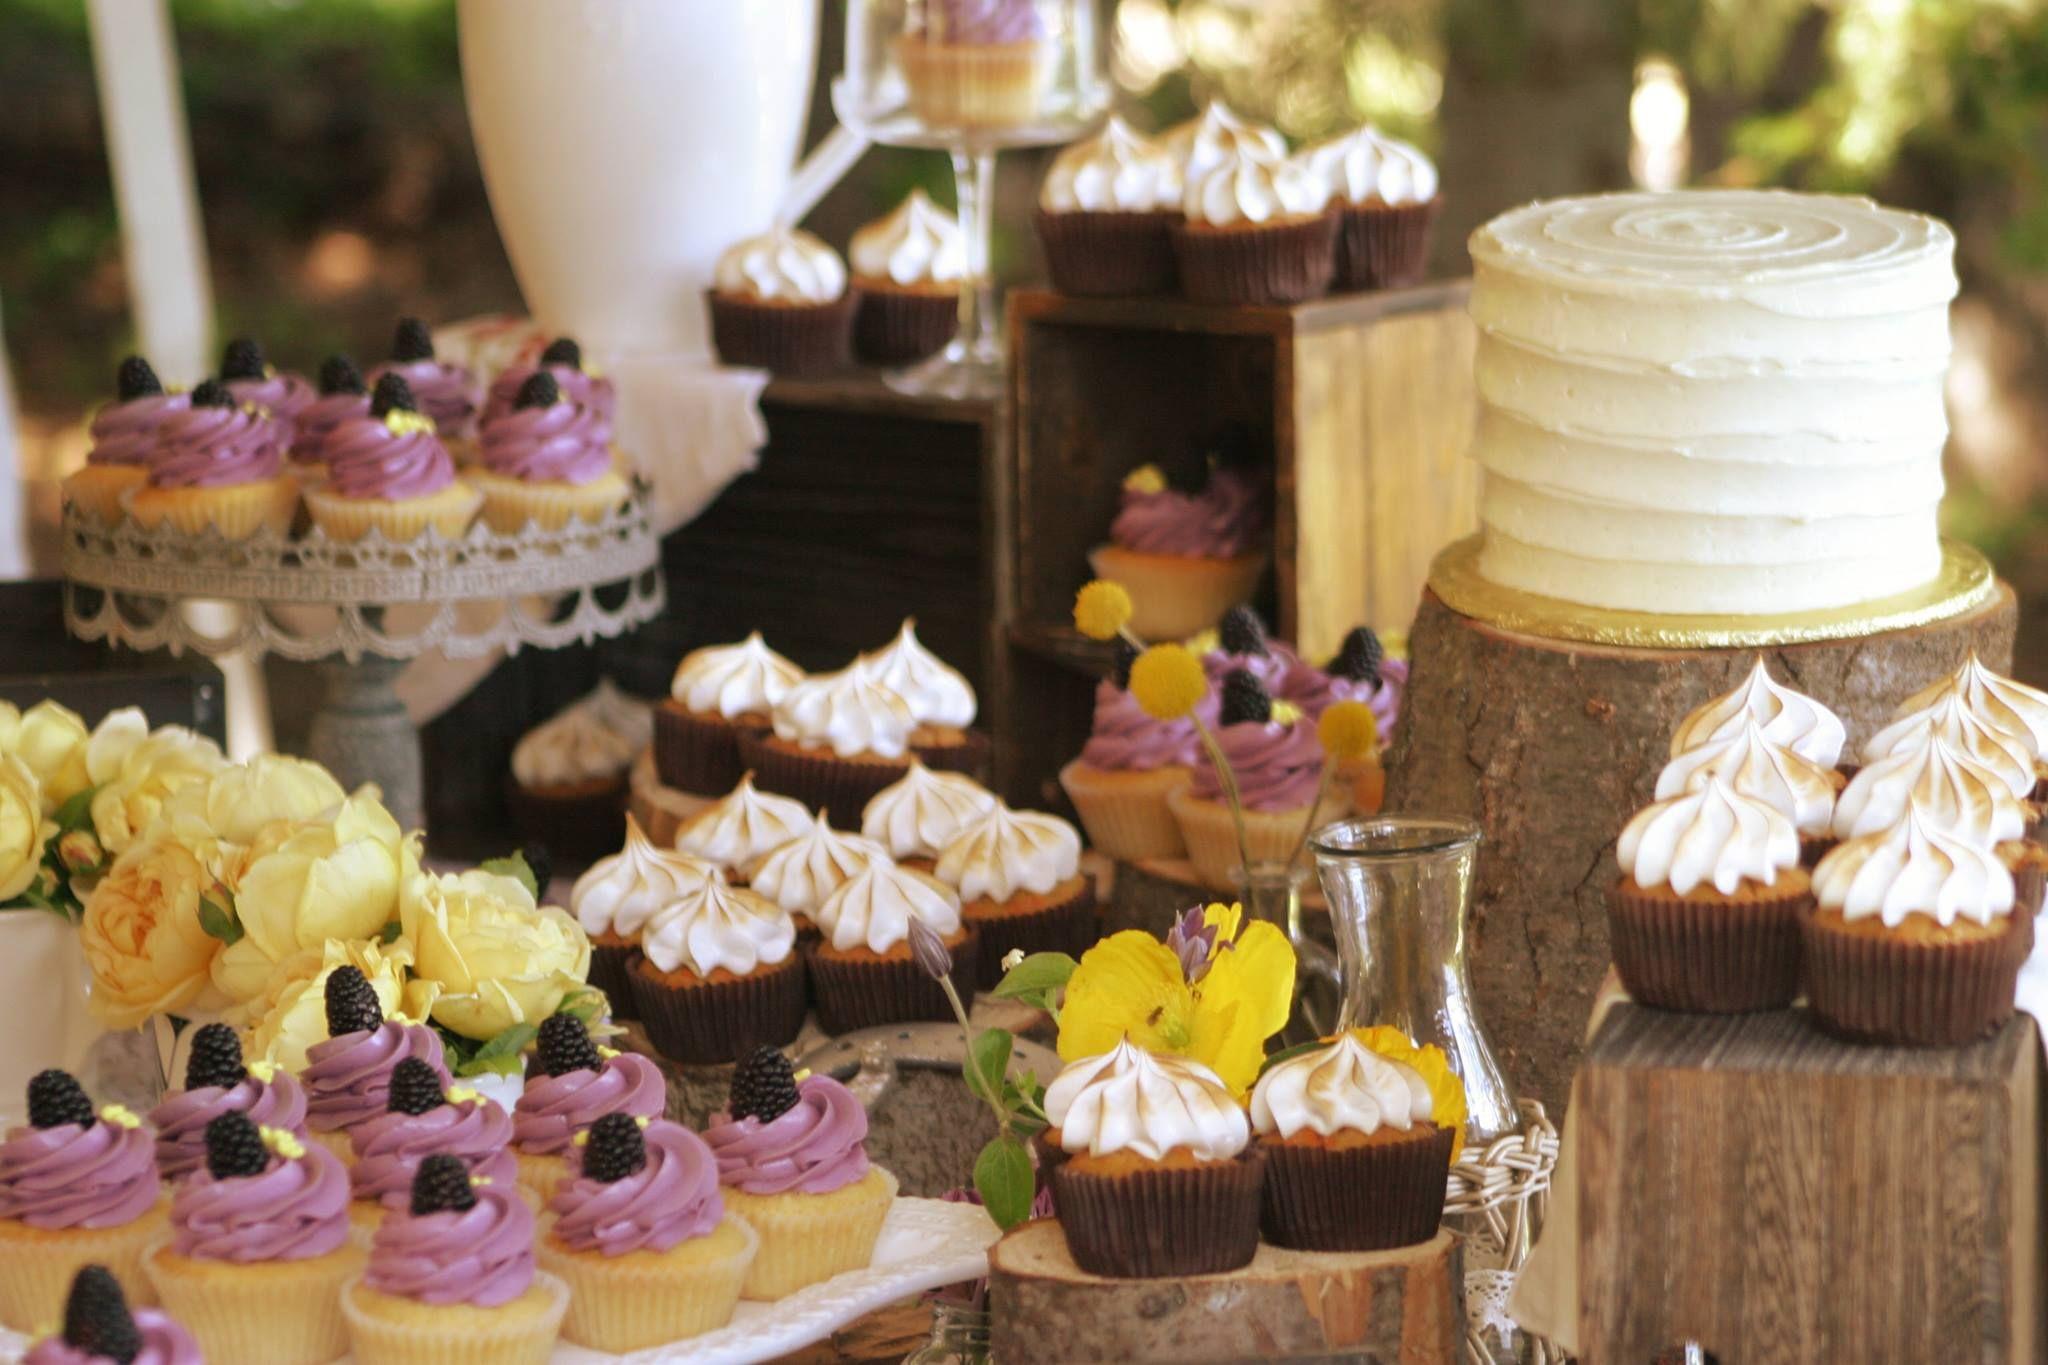 Celebrations Kyra's Bake Shop Gluten free wedding cake